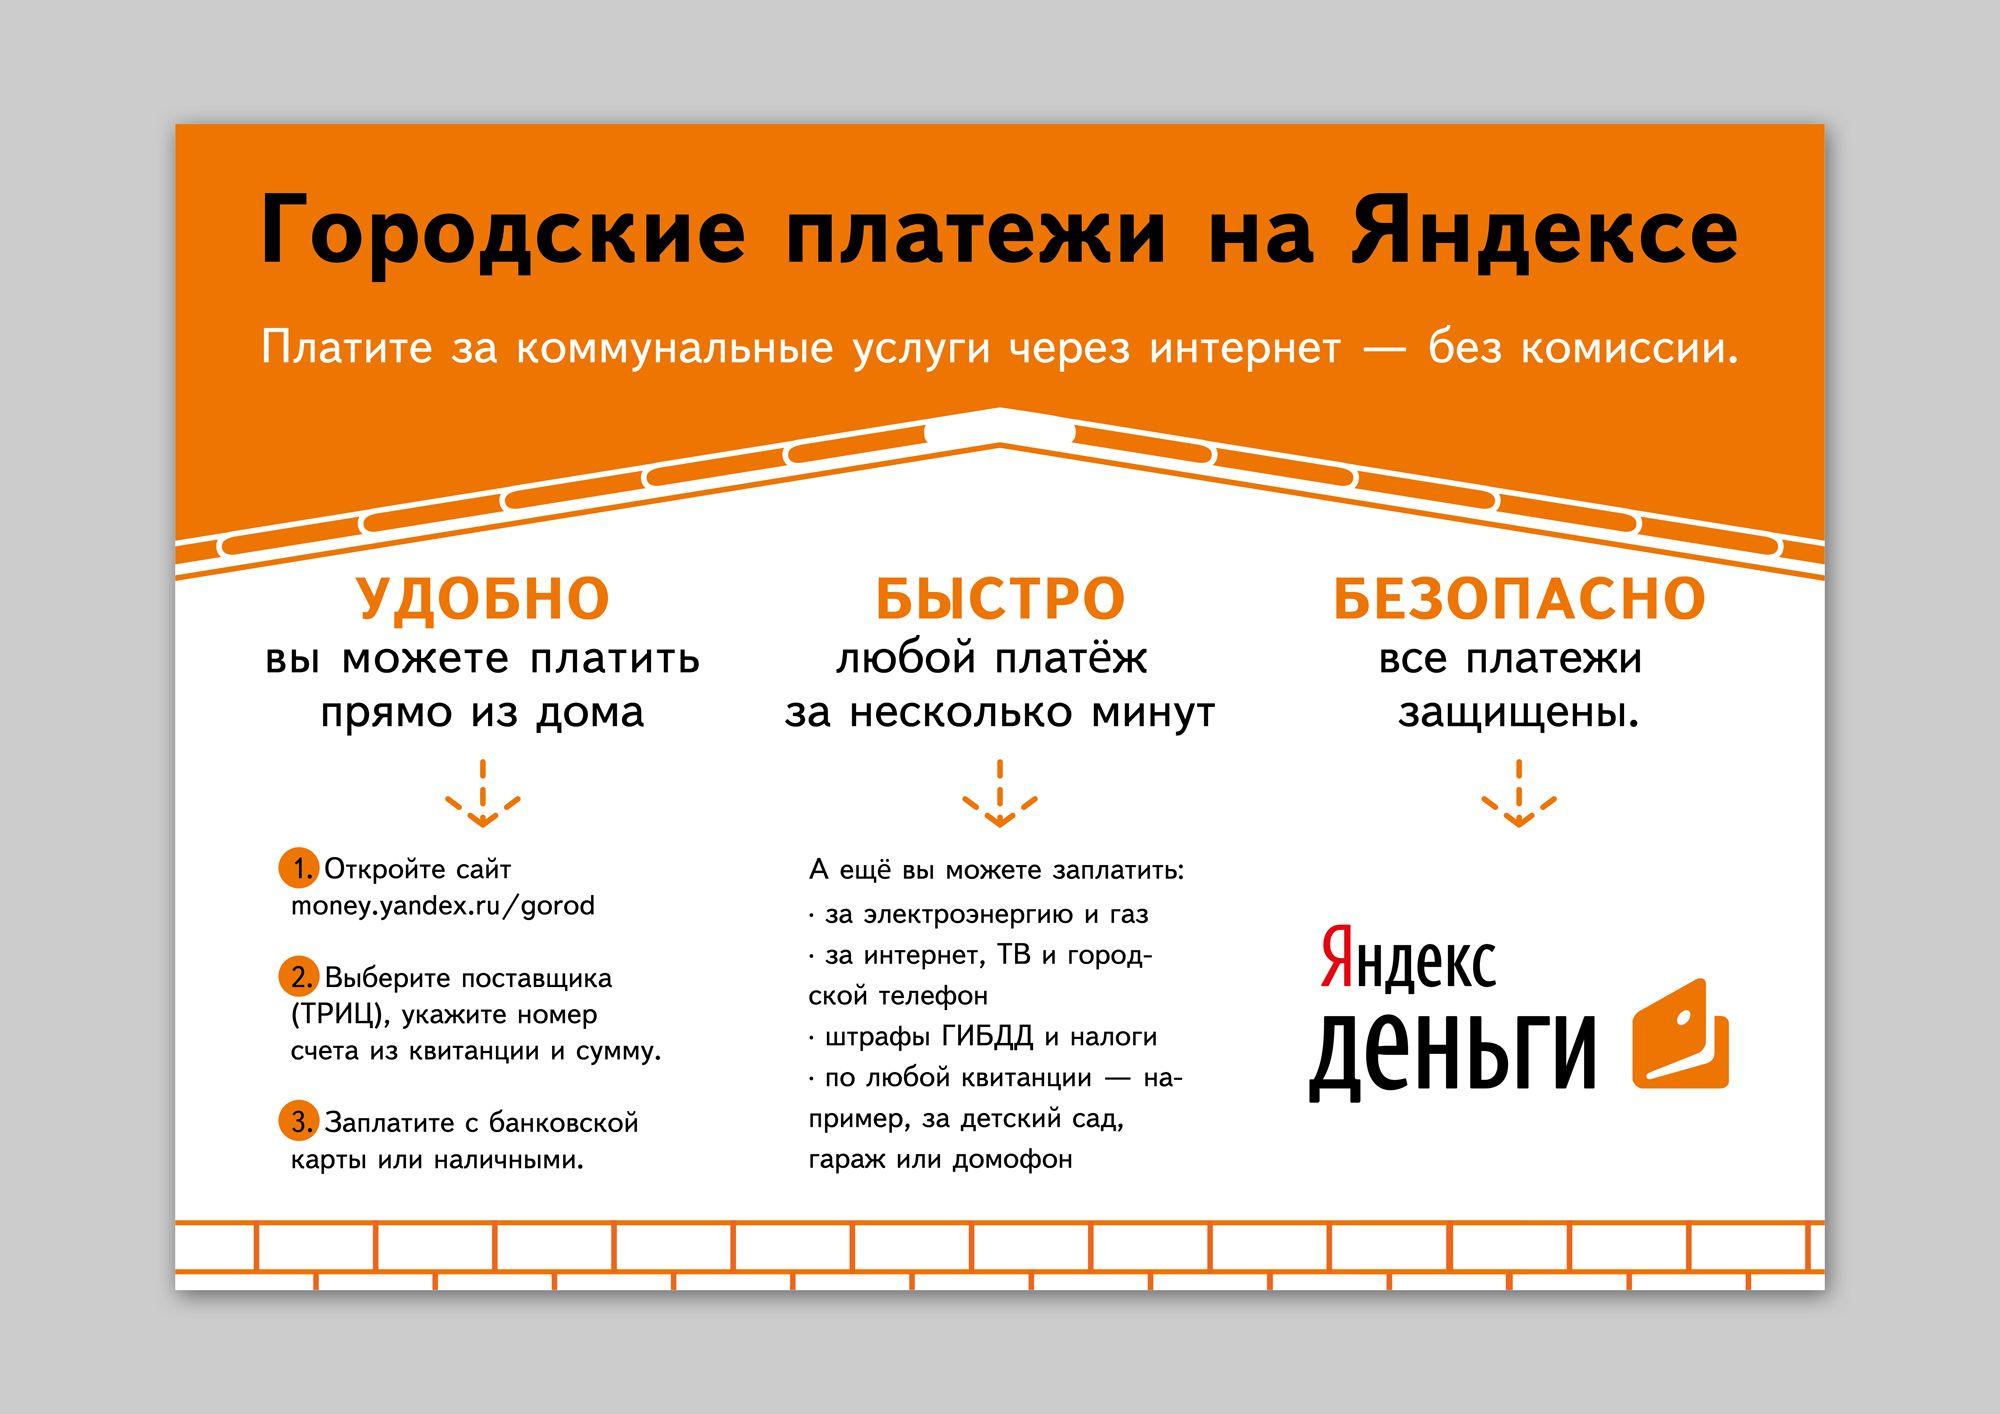 Реклама Яндекс.Денег для оплаты ЖКХ - дизайнер Alena_Little